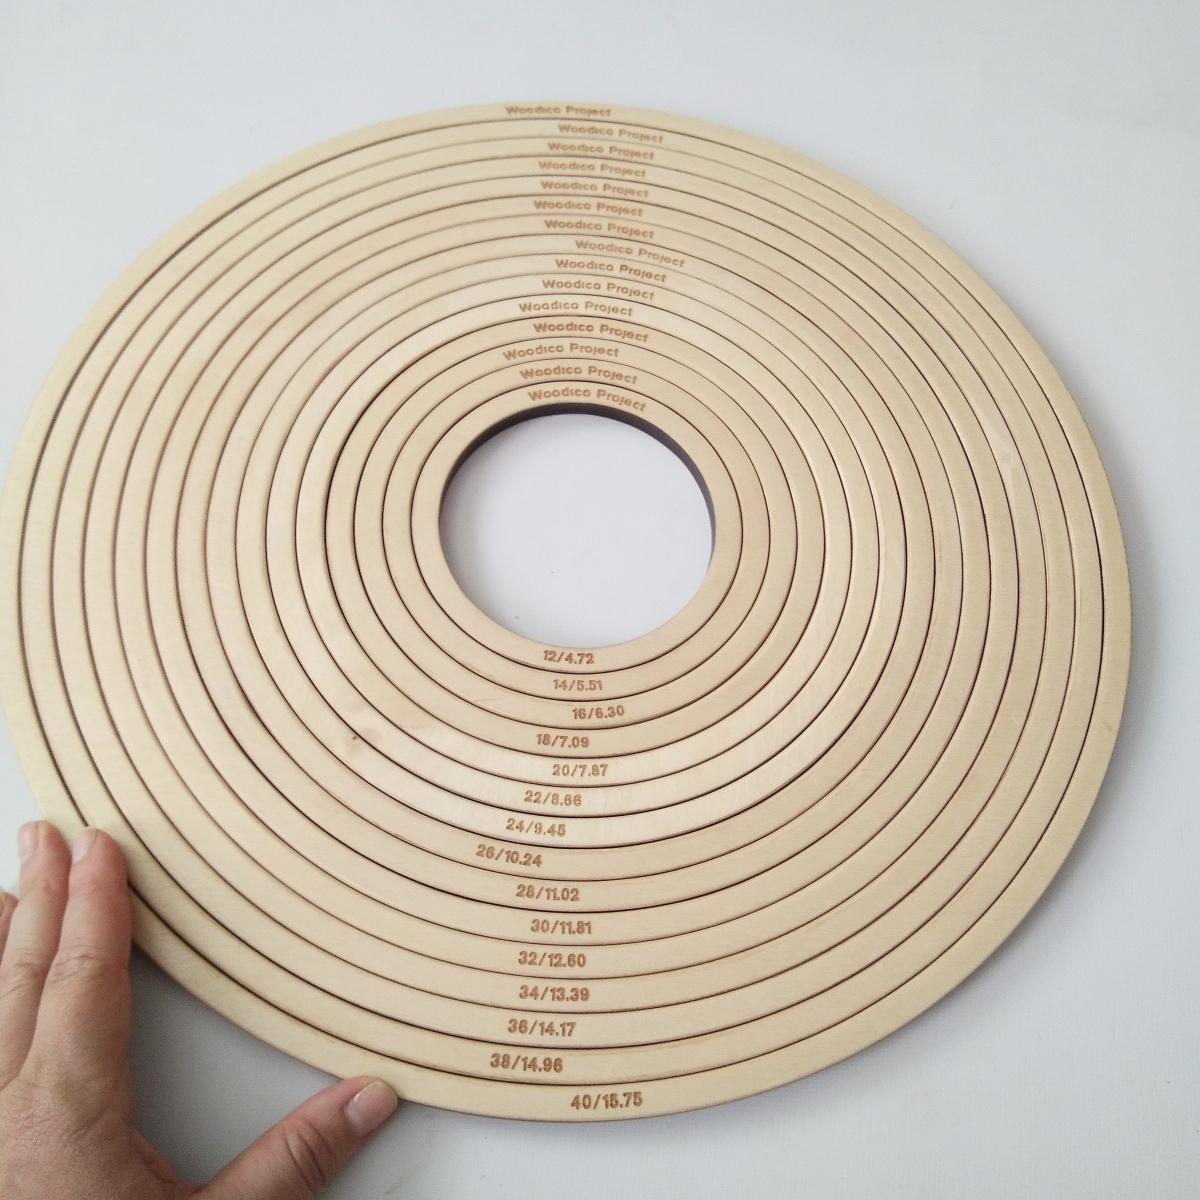 woodico.pro dream catcher base set of 15 rings 12 40 cm 16 1200x1200 - Dream catcher base / Set of 15 rings 12-40 cm